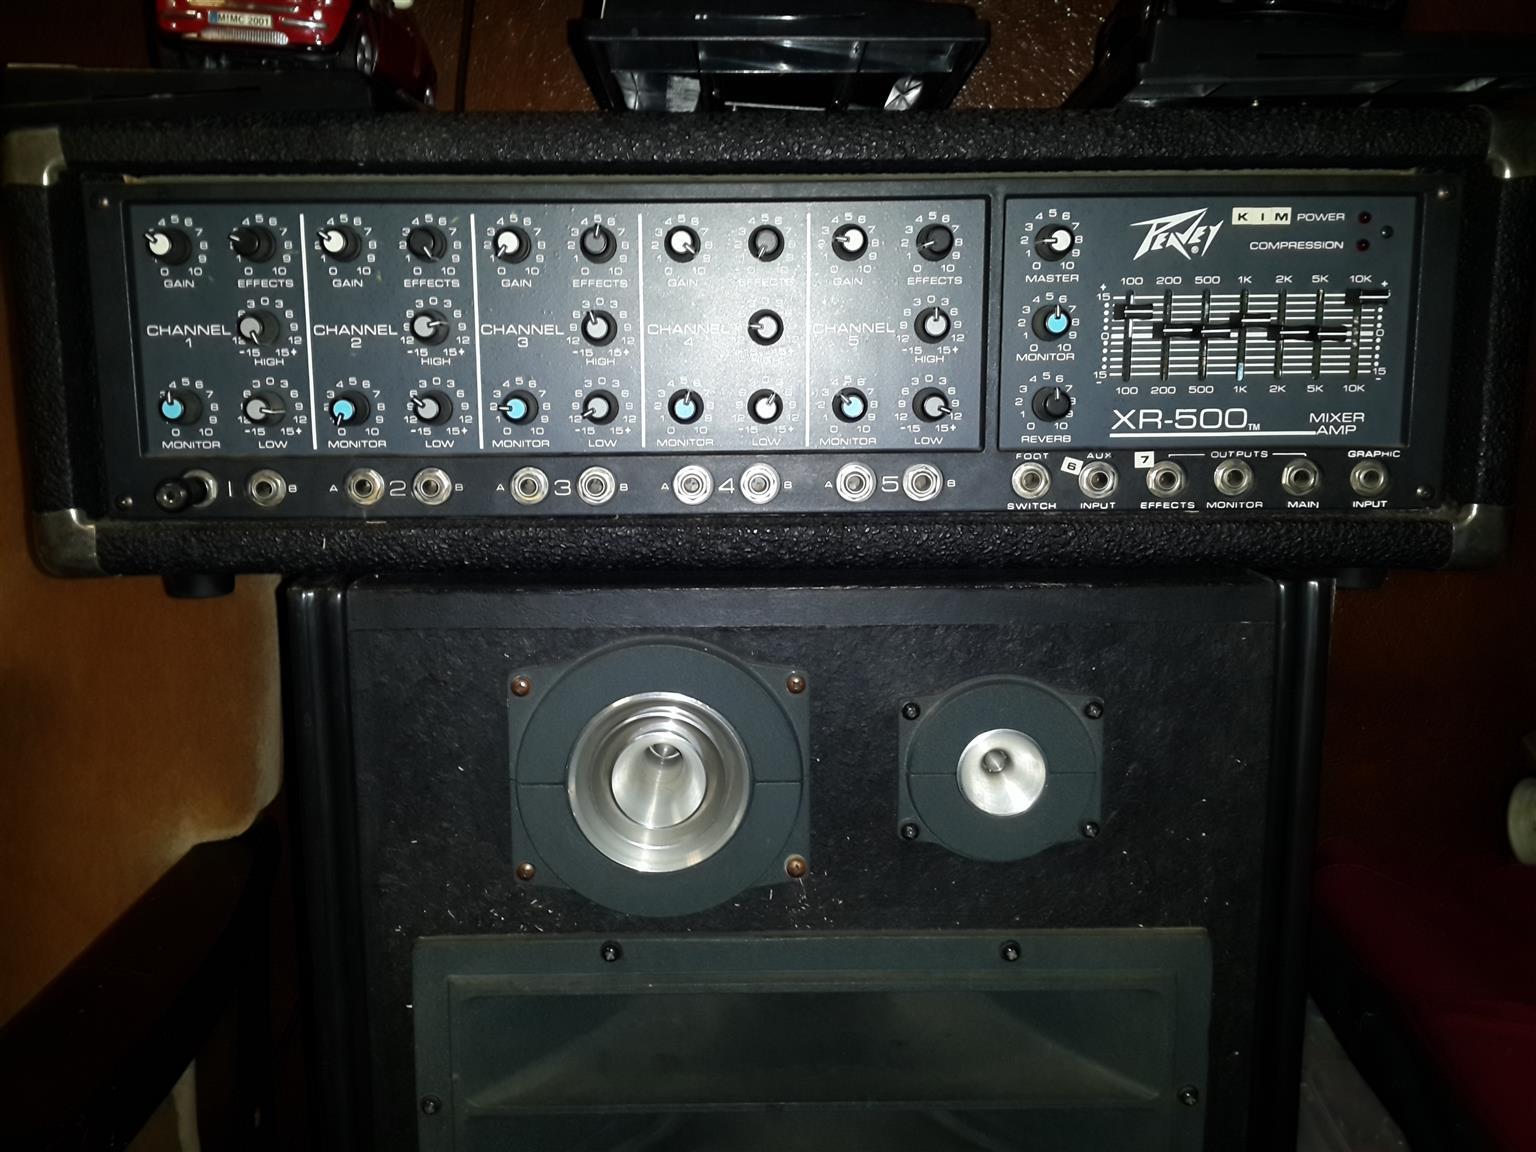 Peavey XR 500 Mixer Amplifier